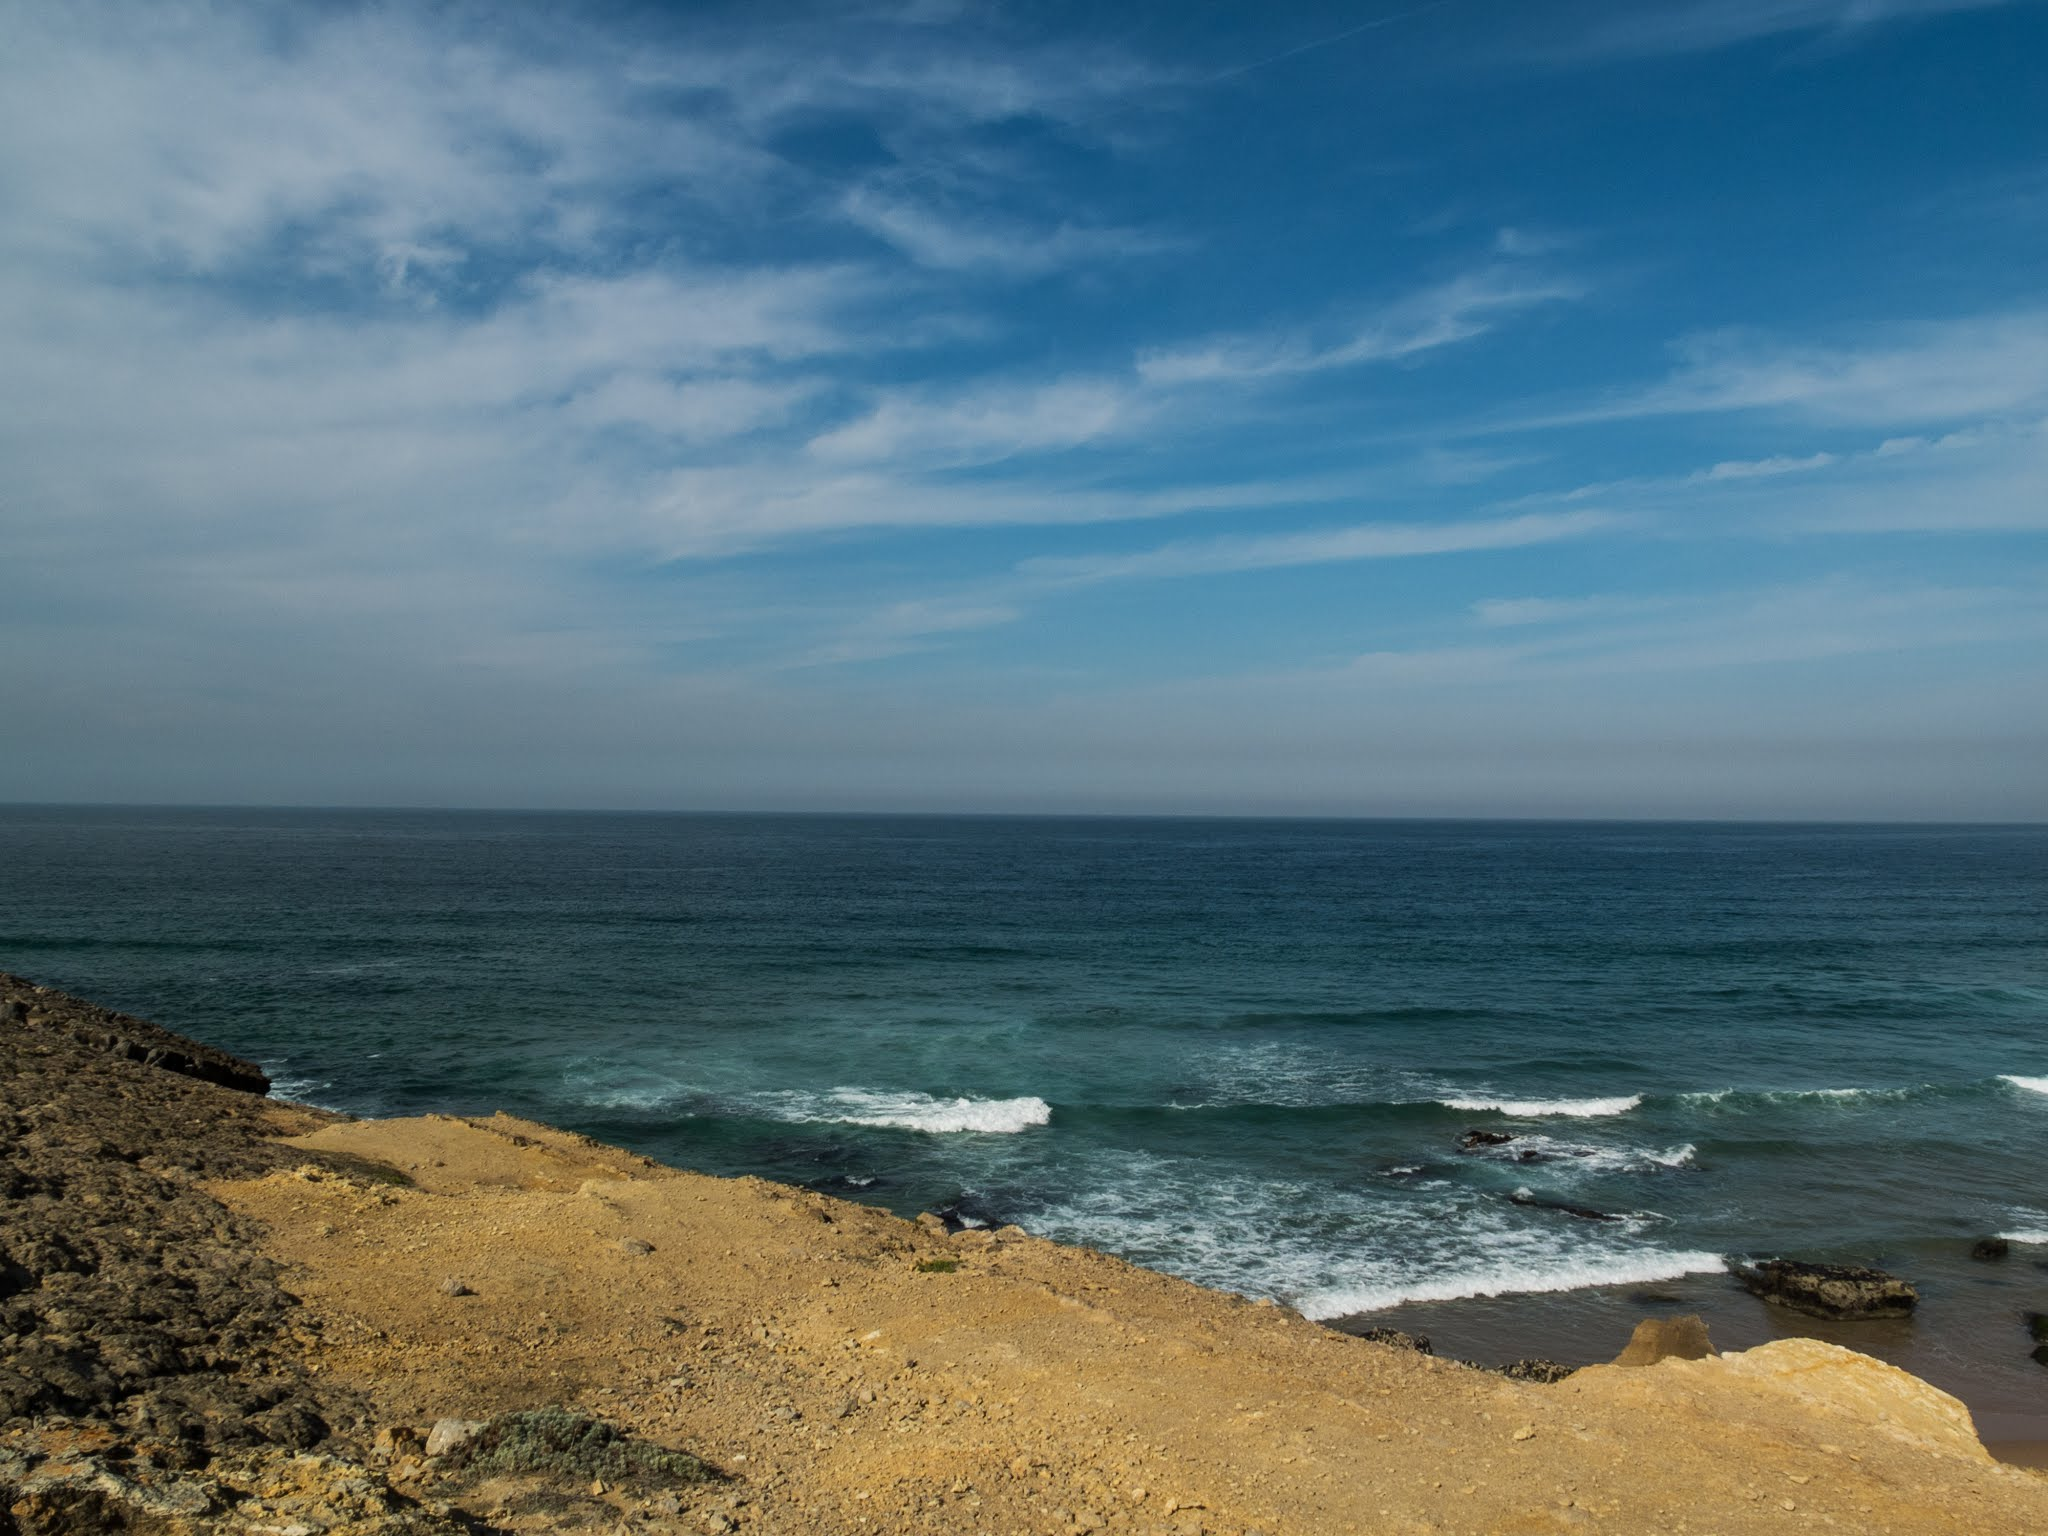 The Atlantic Ocean Coast of Praia da Guincho in Portugal.